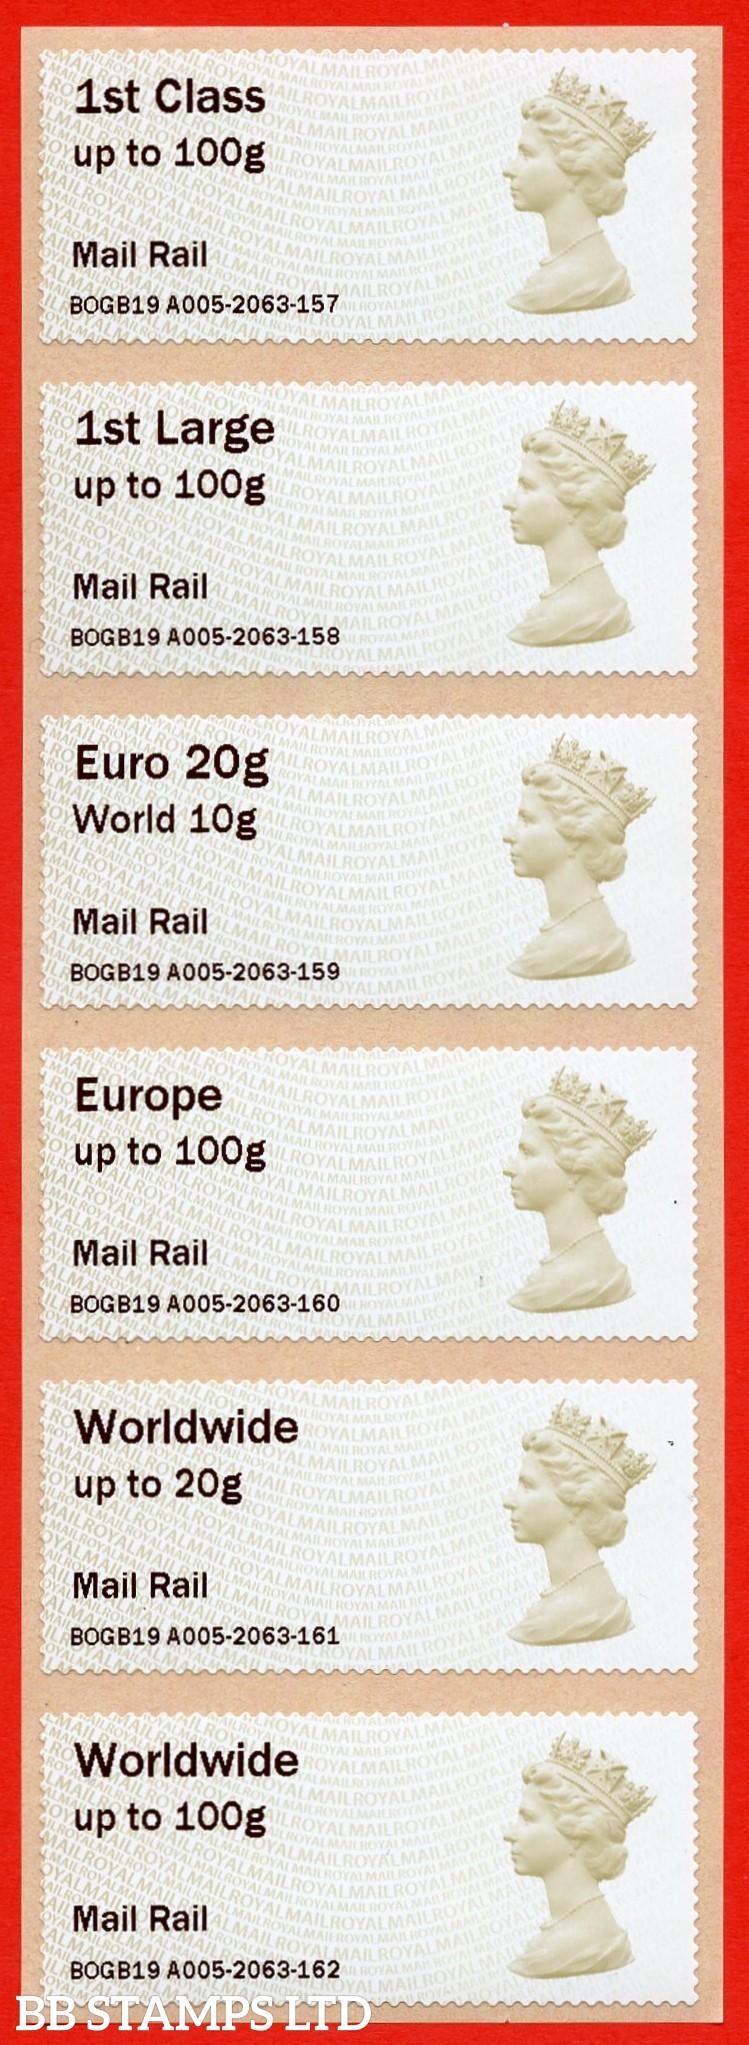 Machin Mail Rail: 1st - W/Wide 100g: MA14 Type IIIA (set of 6) (BK29,P3)